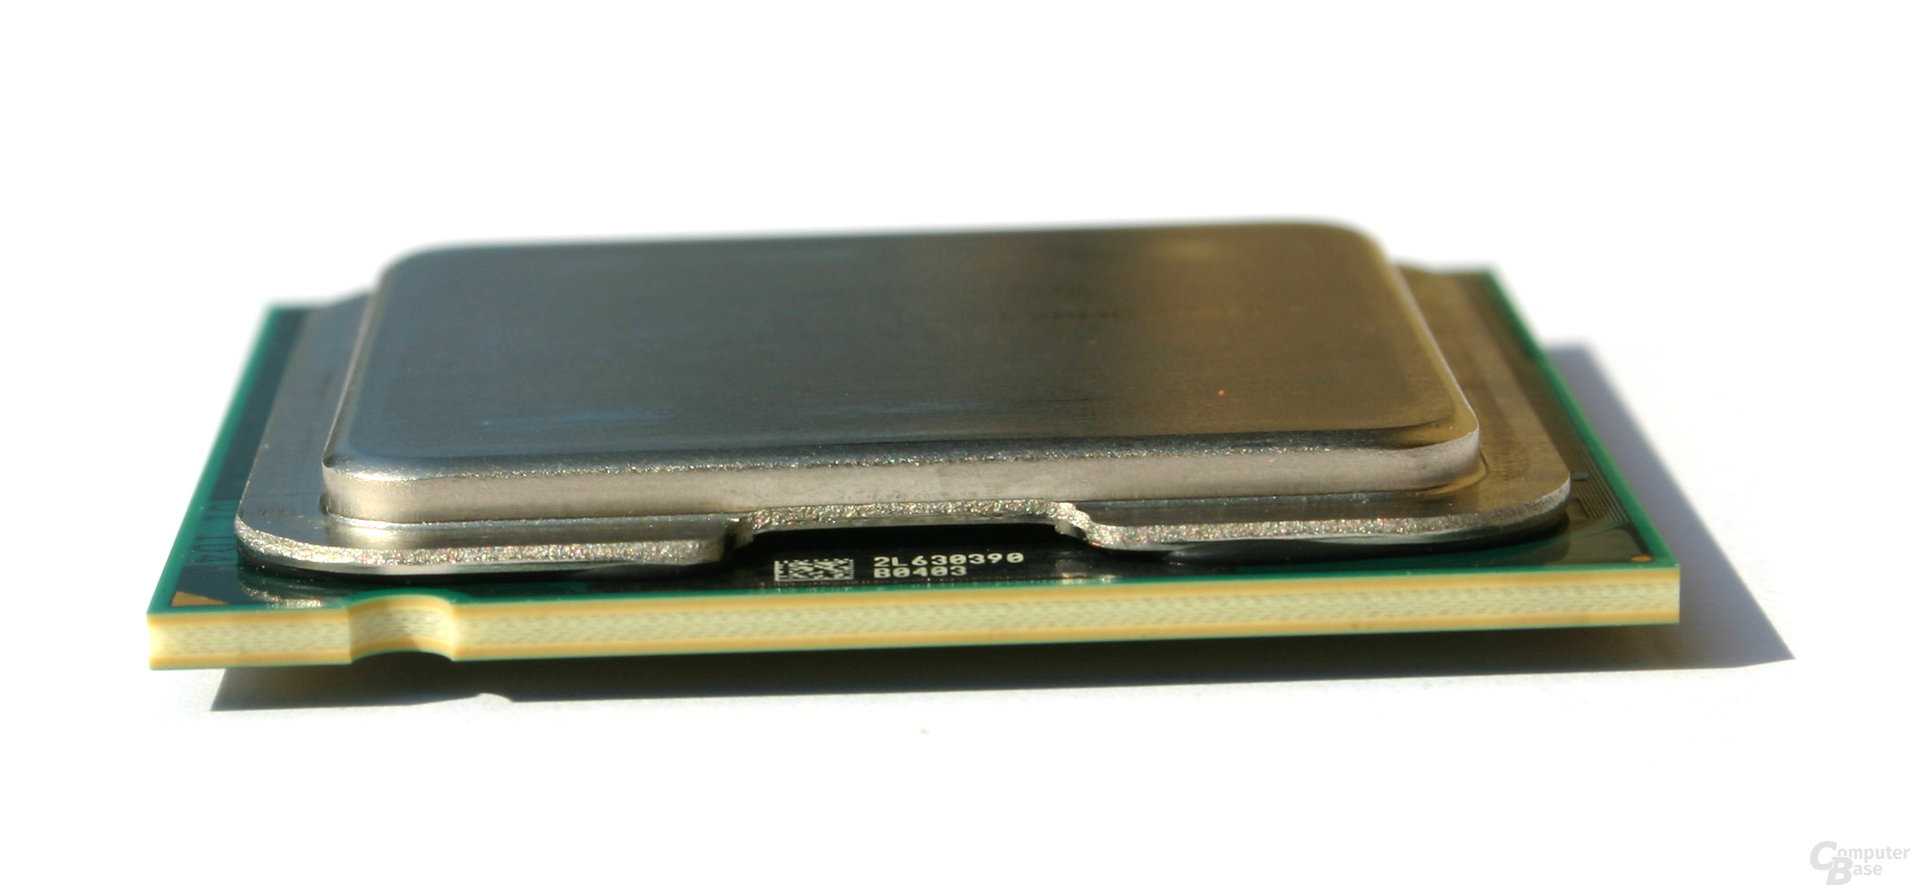 Intel Core 2 Extreme QX6800 (Seite)